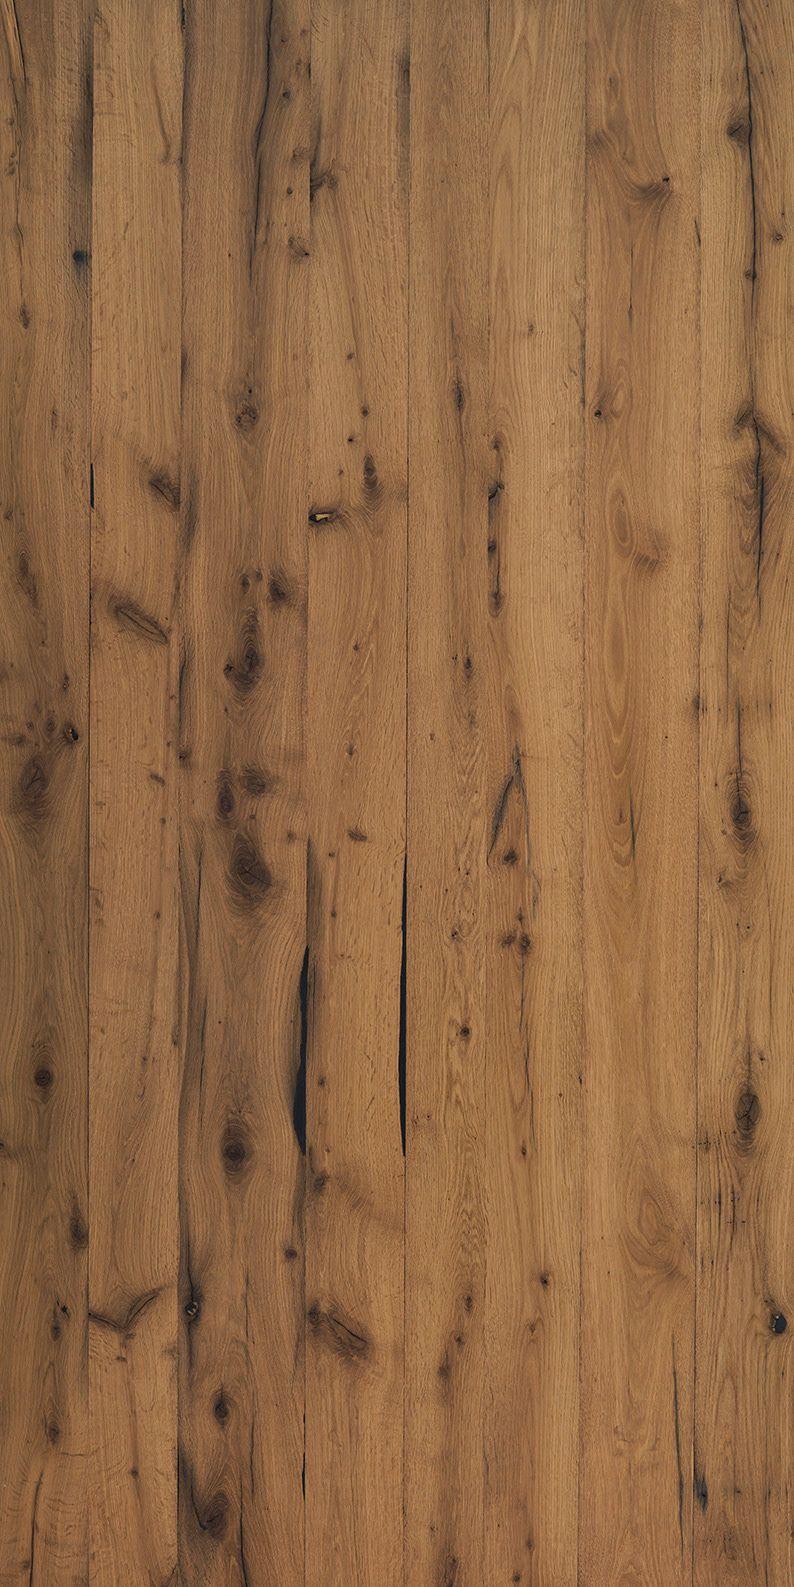 Free 13 Plaats Of Wood Texture Oak Vintage Hoboken On Behance En 2020 Texture Bois Bois Et Texture